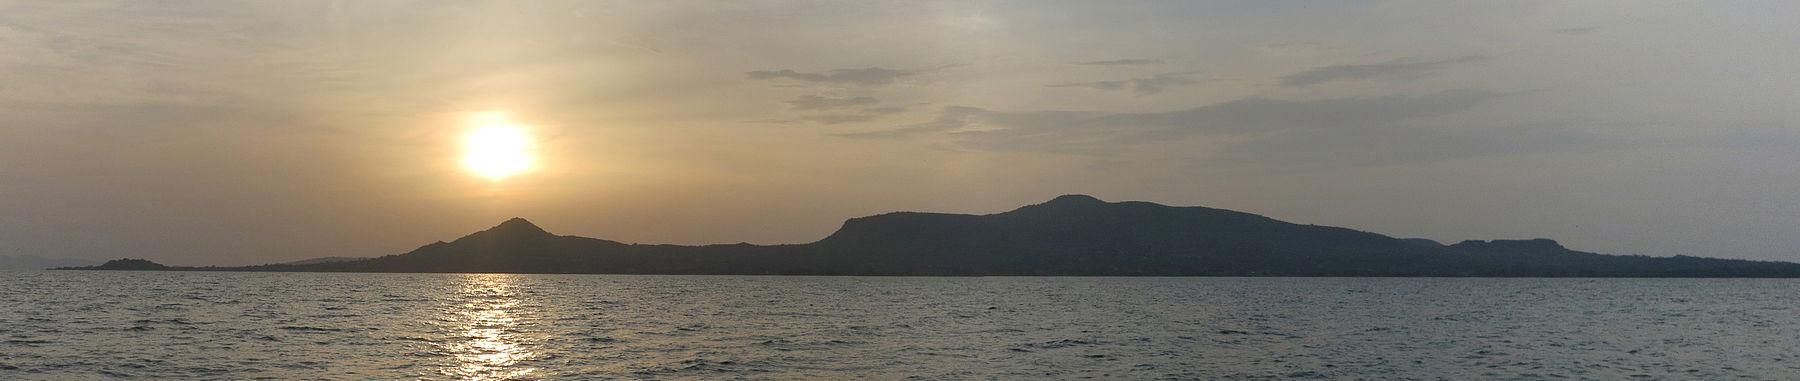 Rusinga Island - Lake Victoria - Kenya.jpg